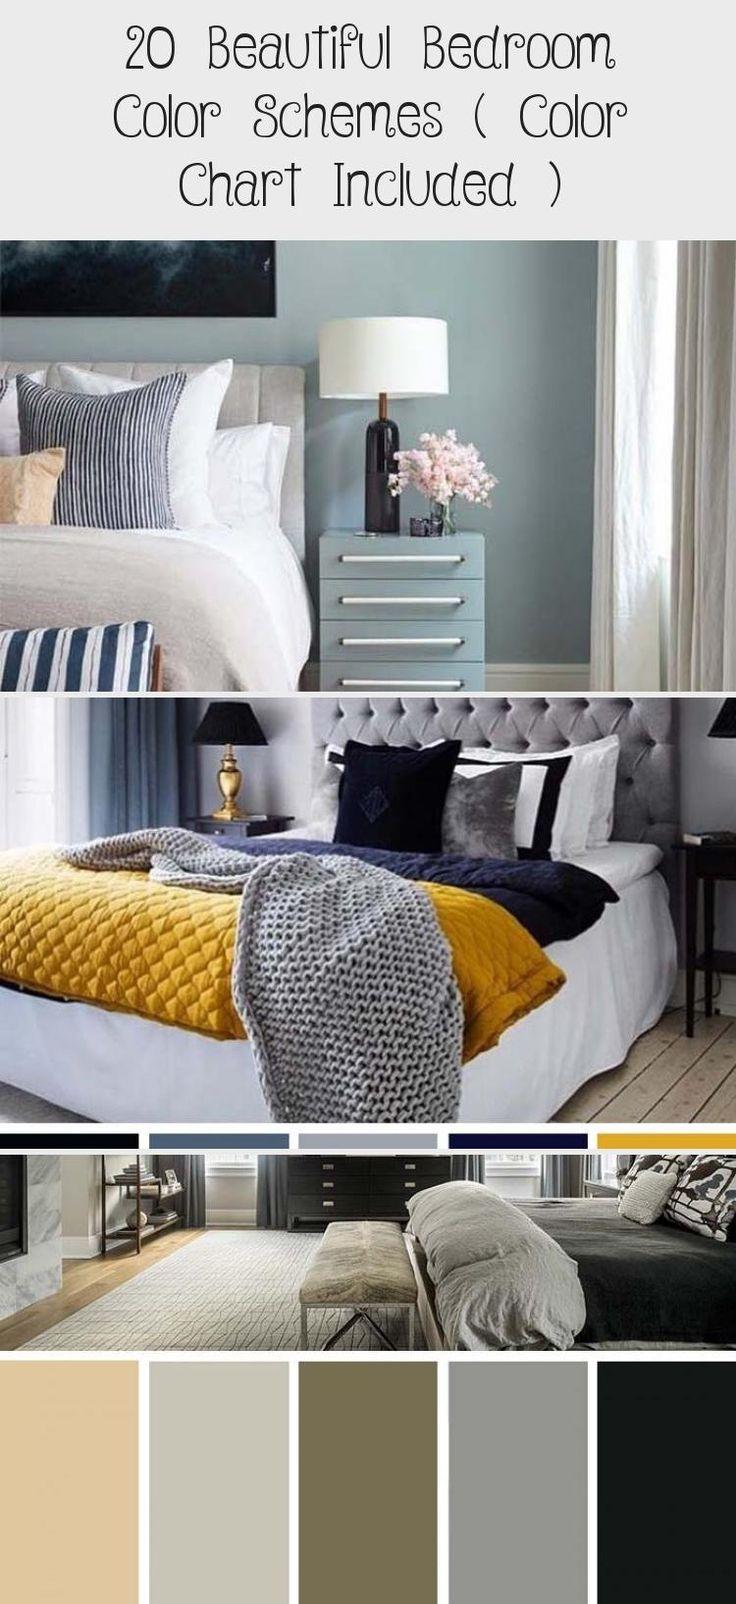 Pastel Color Bedroom Scheme bedroom color scheme